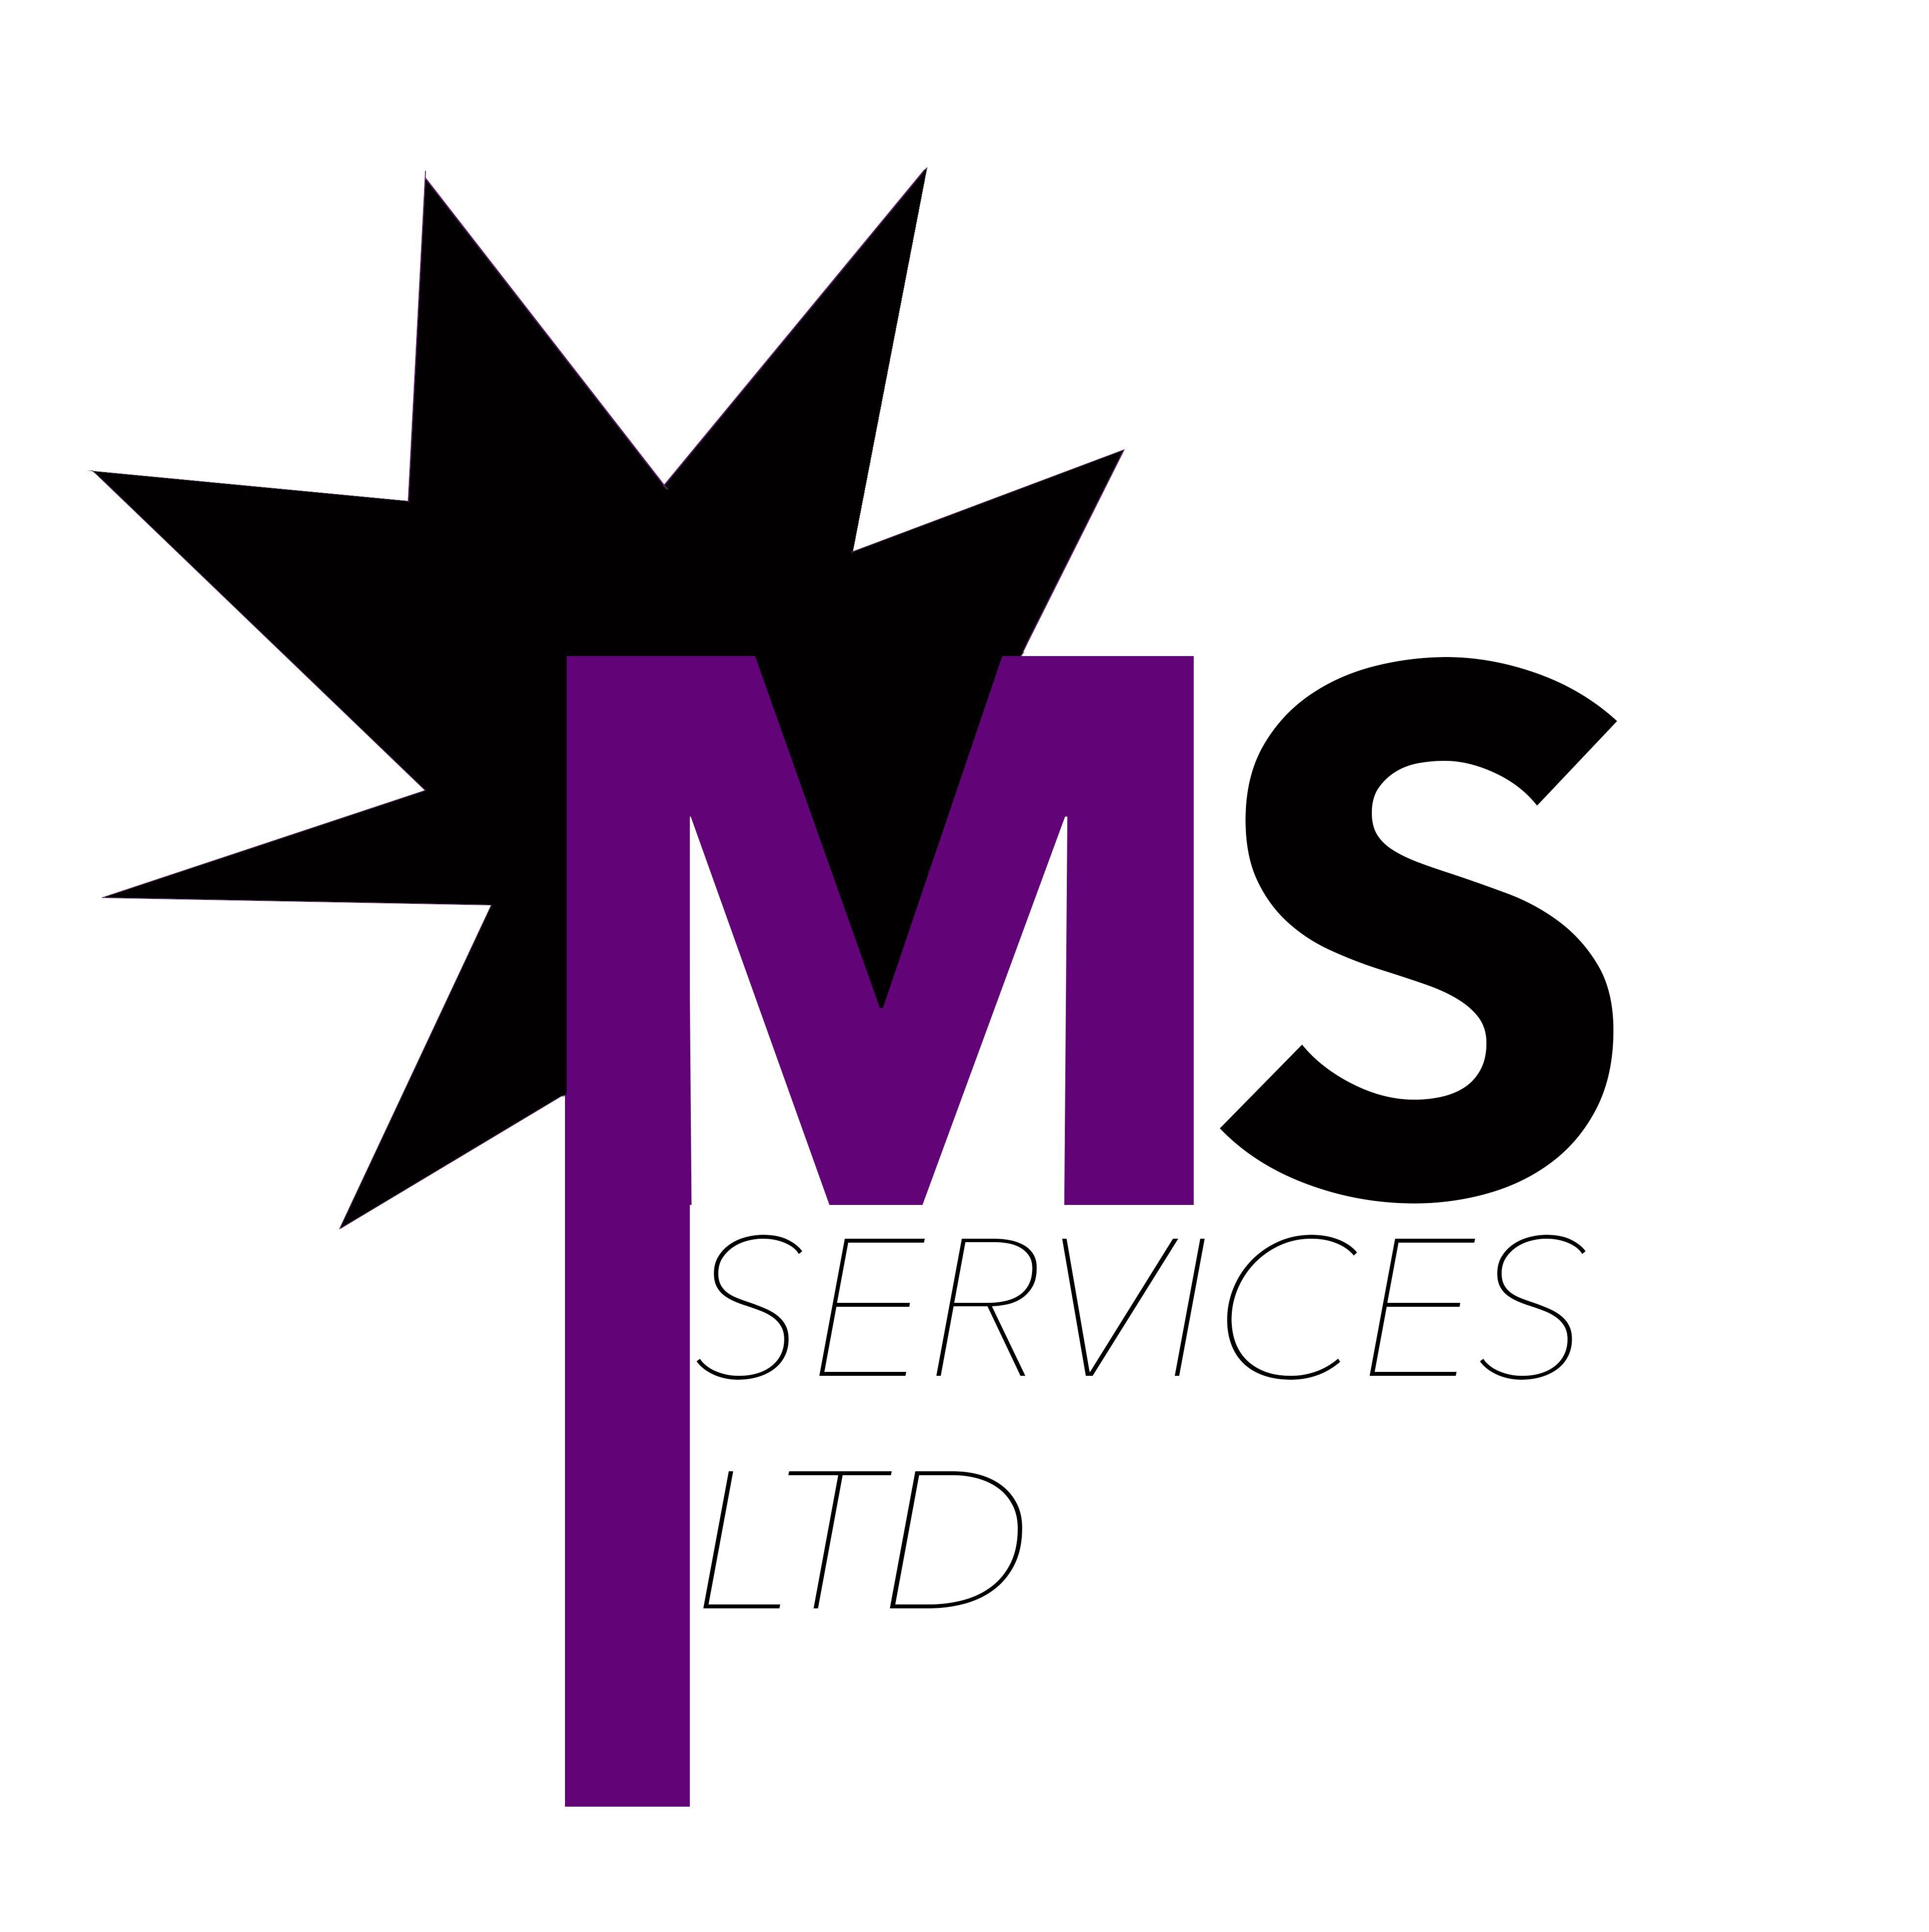 Welcome to MarketSpark Services LTD